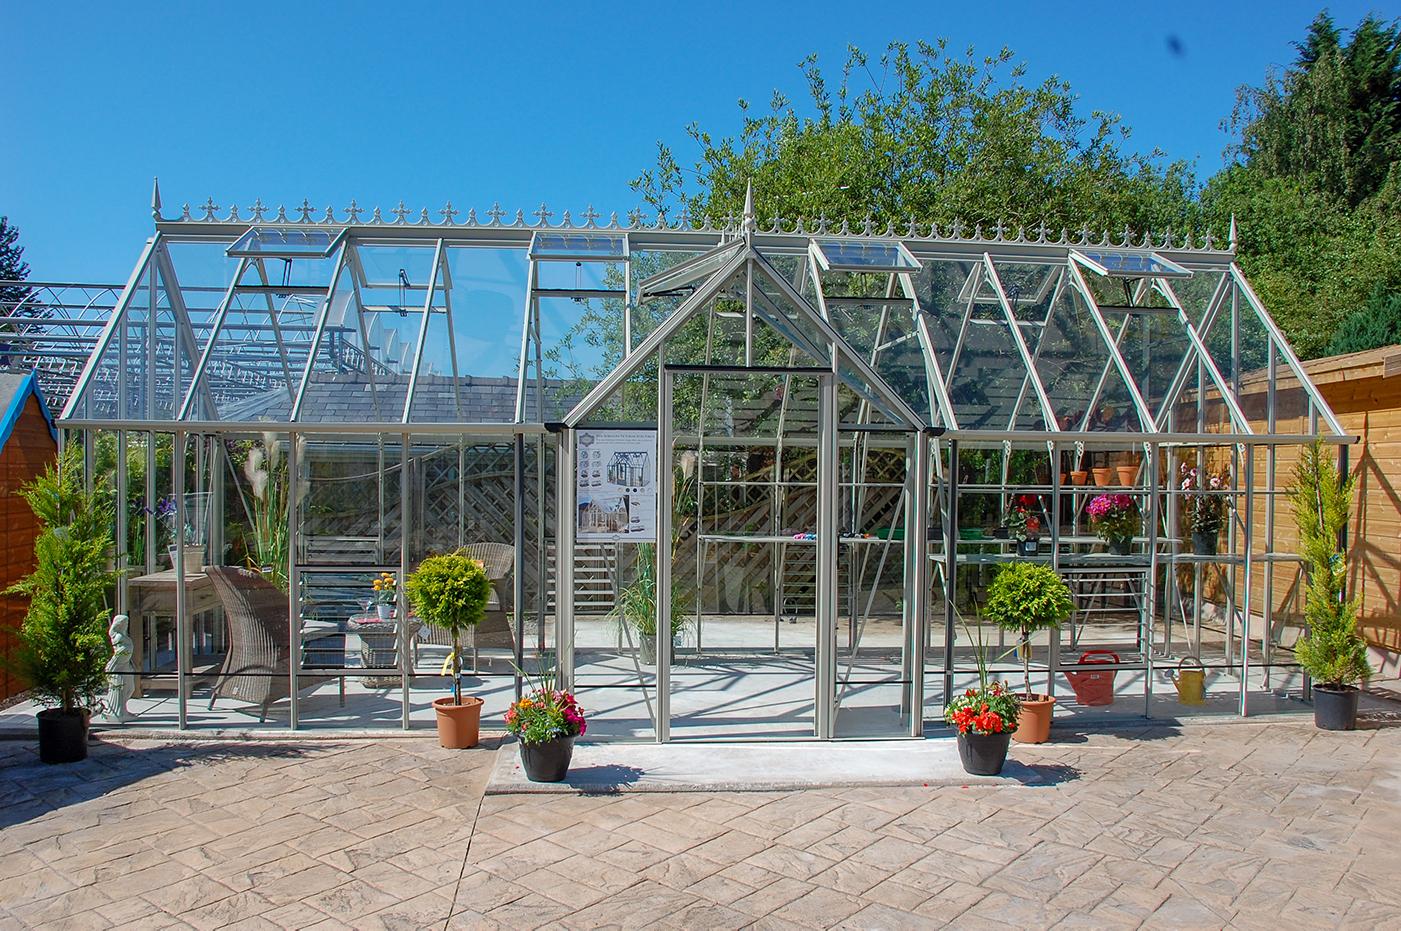 Stunning Robinsons Radley Victorian greenhouse.